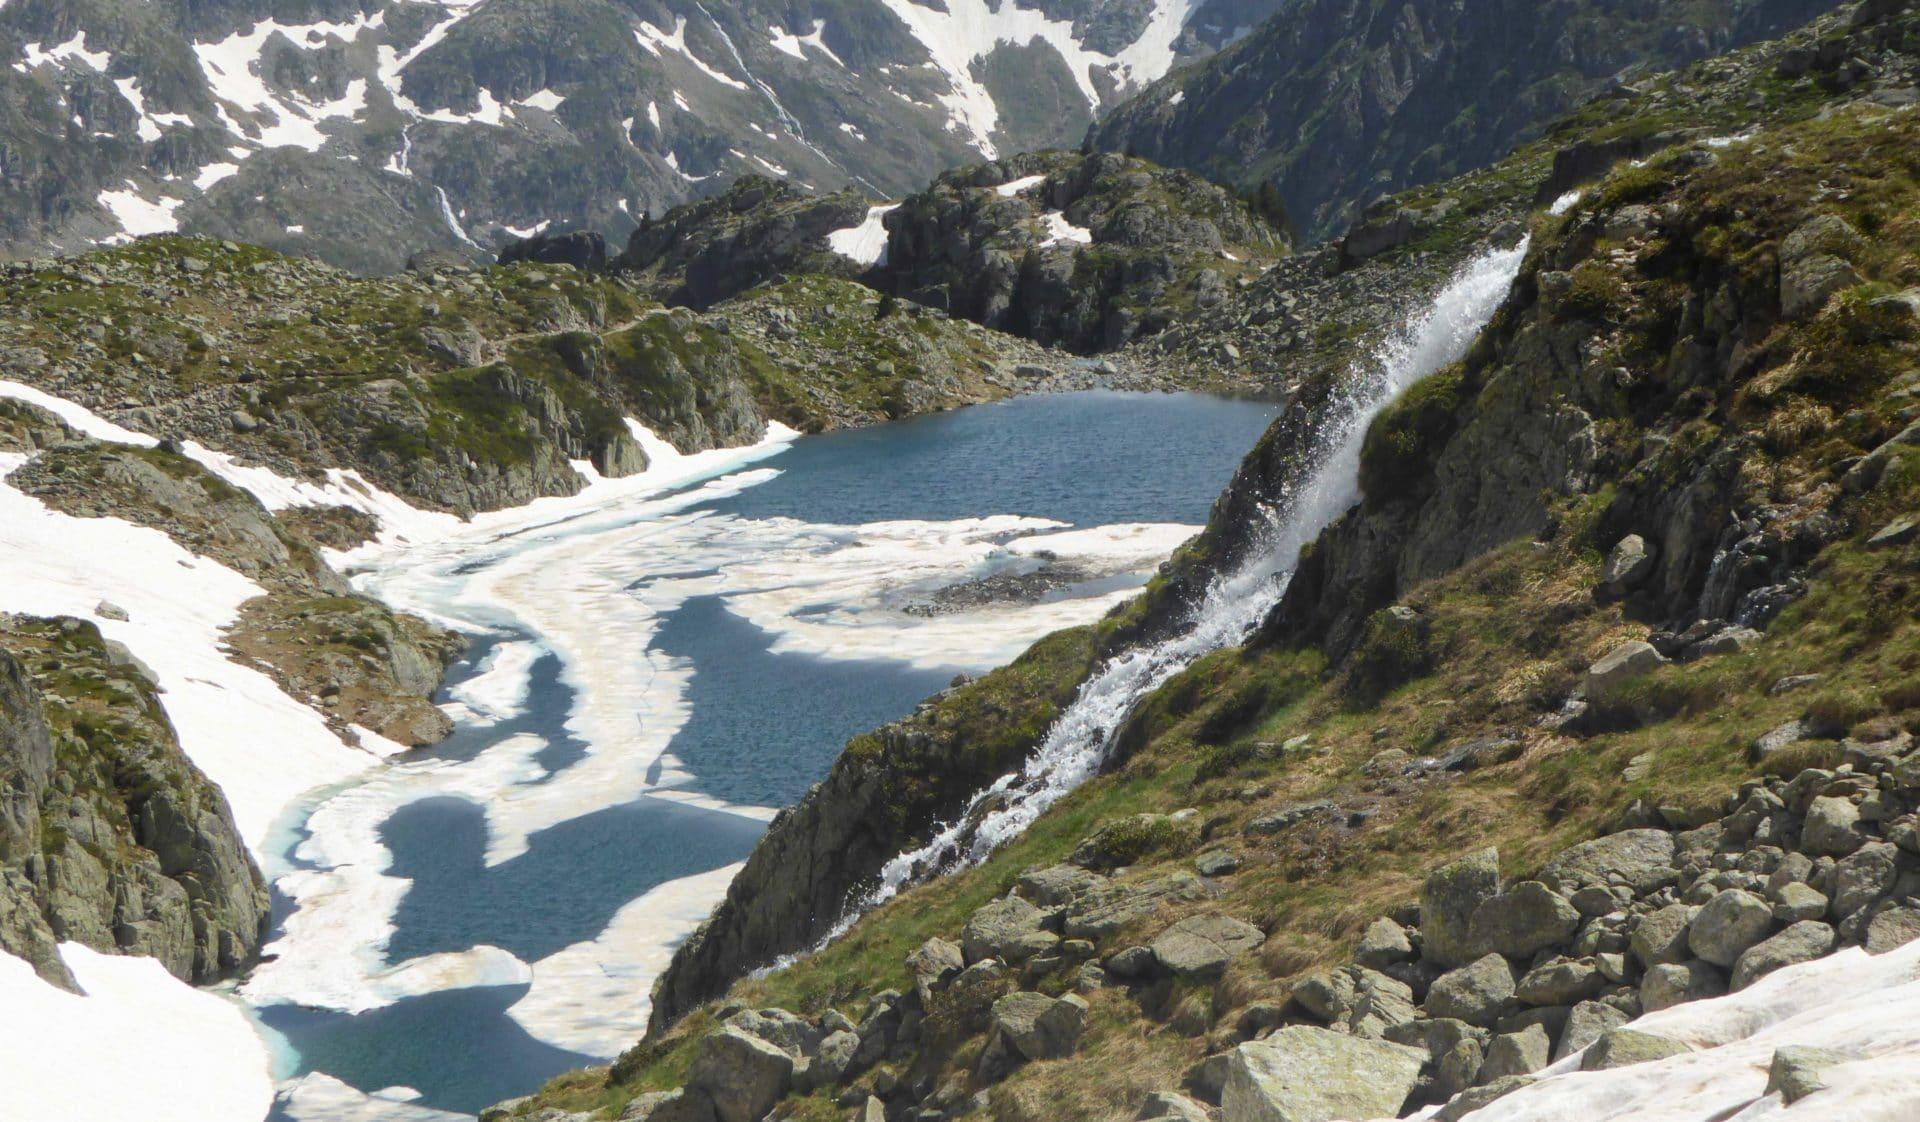 Le lac Nere